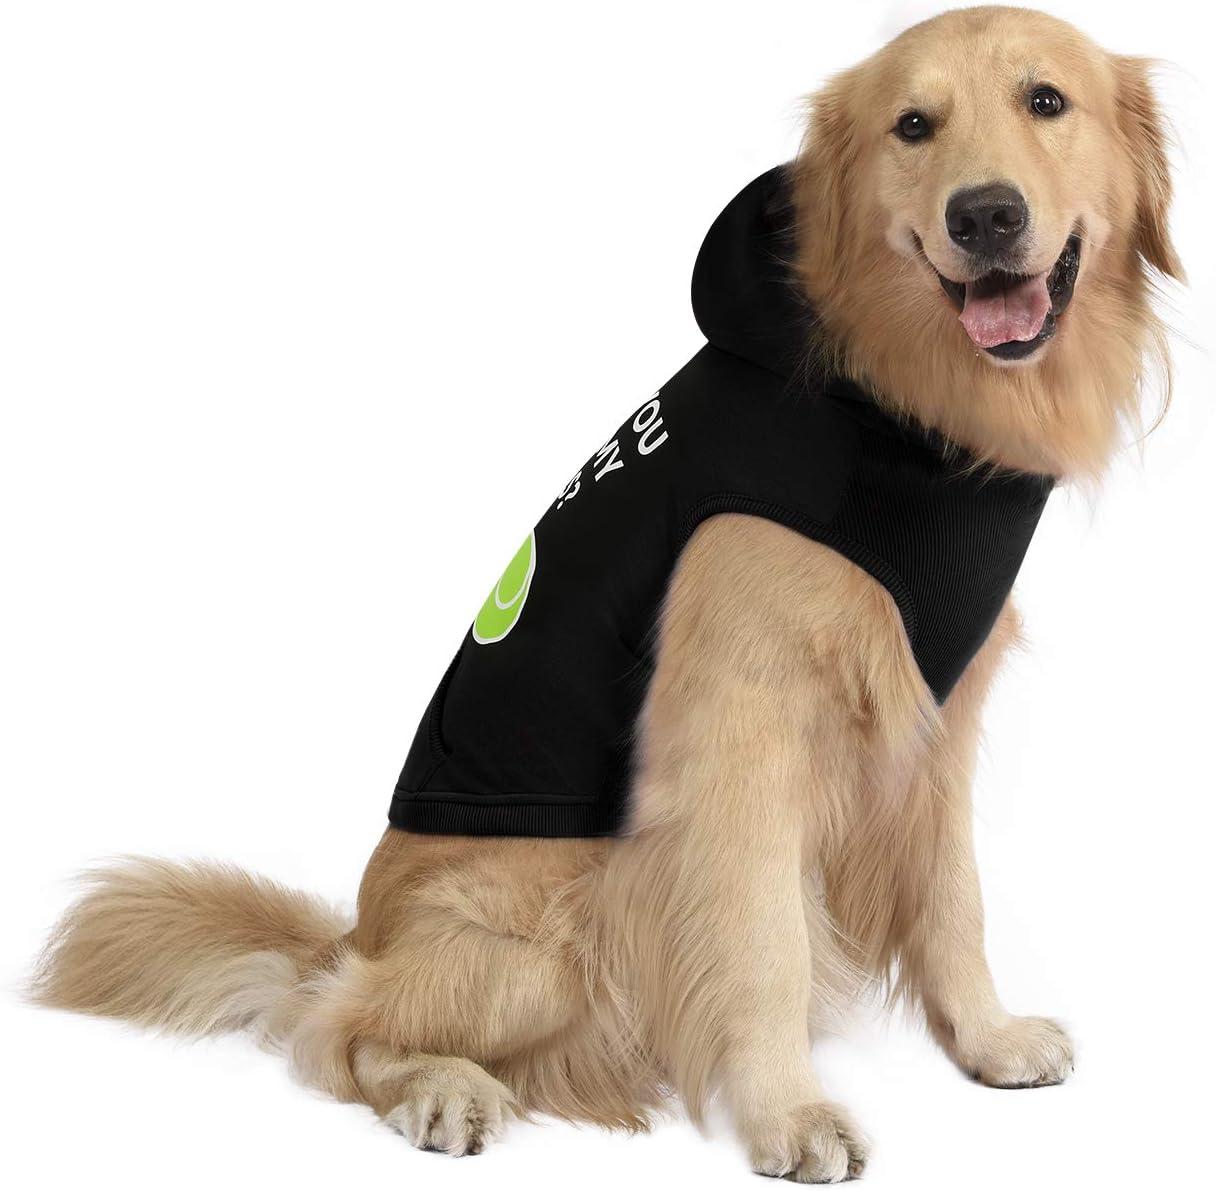 HDE Dog Hoodie Fleece Dog Sweater Hooded Sweatshirt for Large Medium Small Dogs